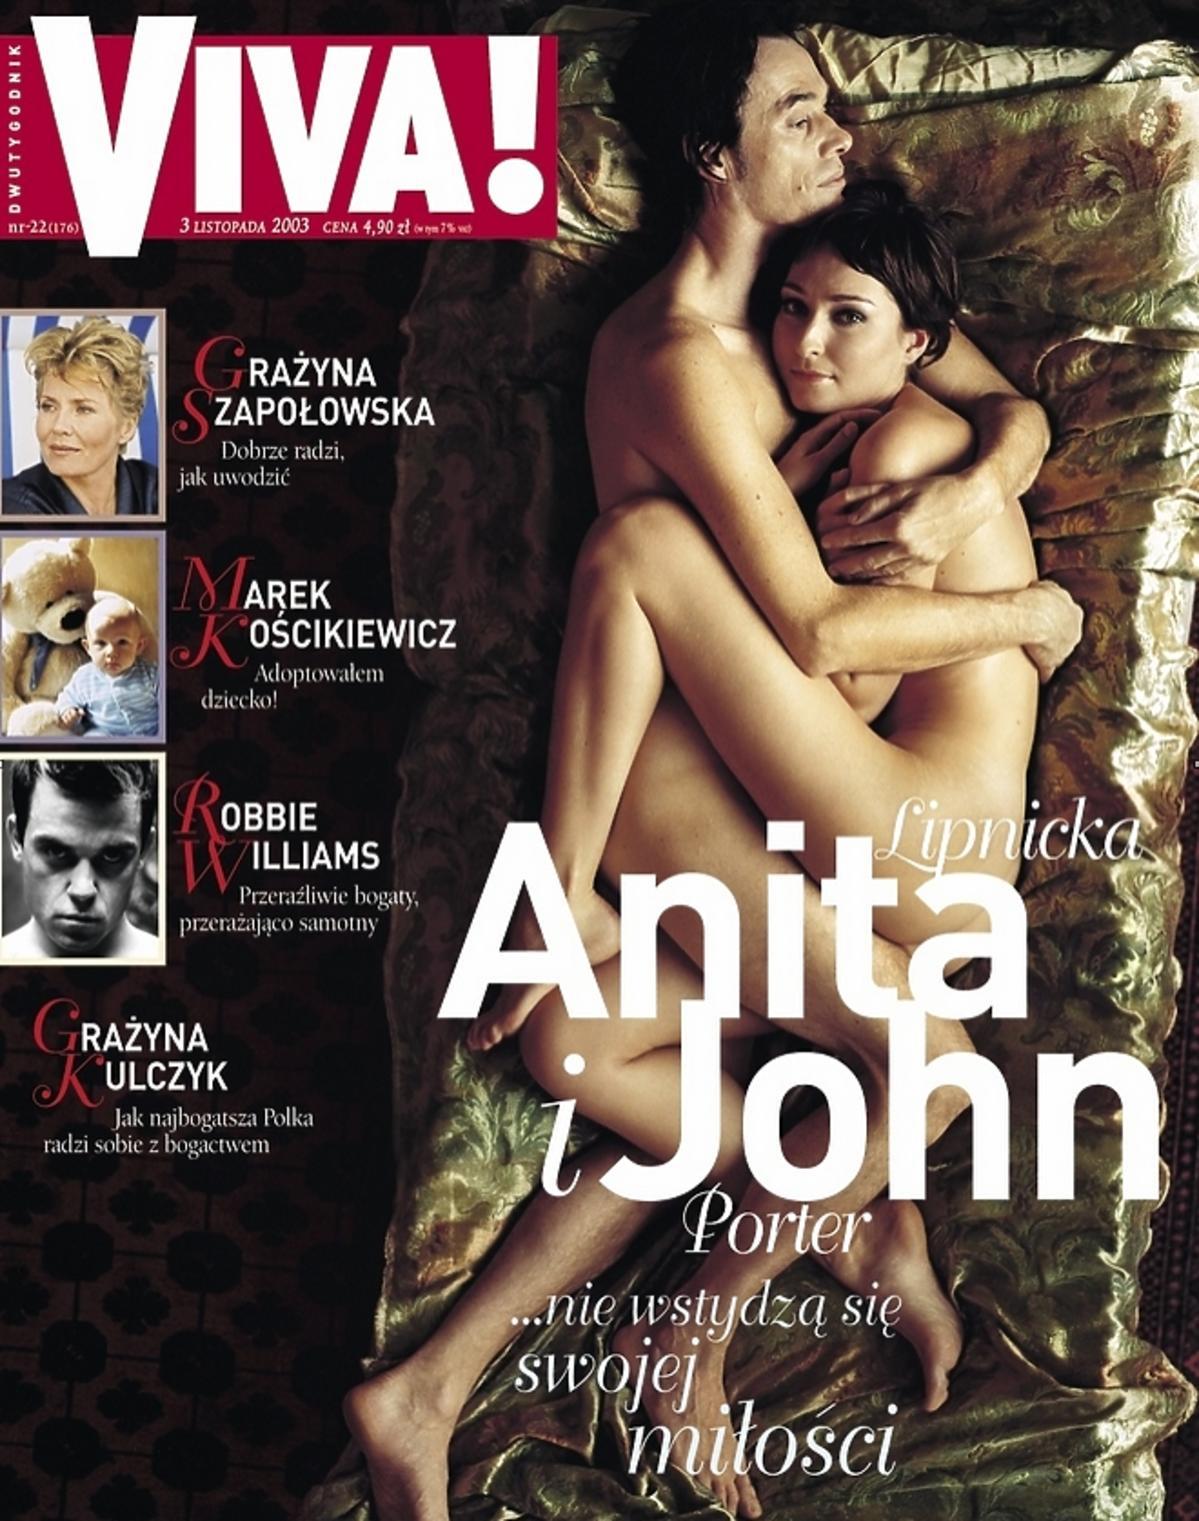 Anita Lipnicka i John Porter nago na okładce Vivy! Wywiad, sesja